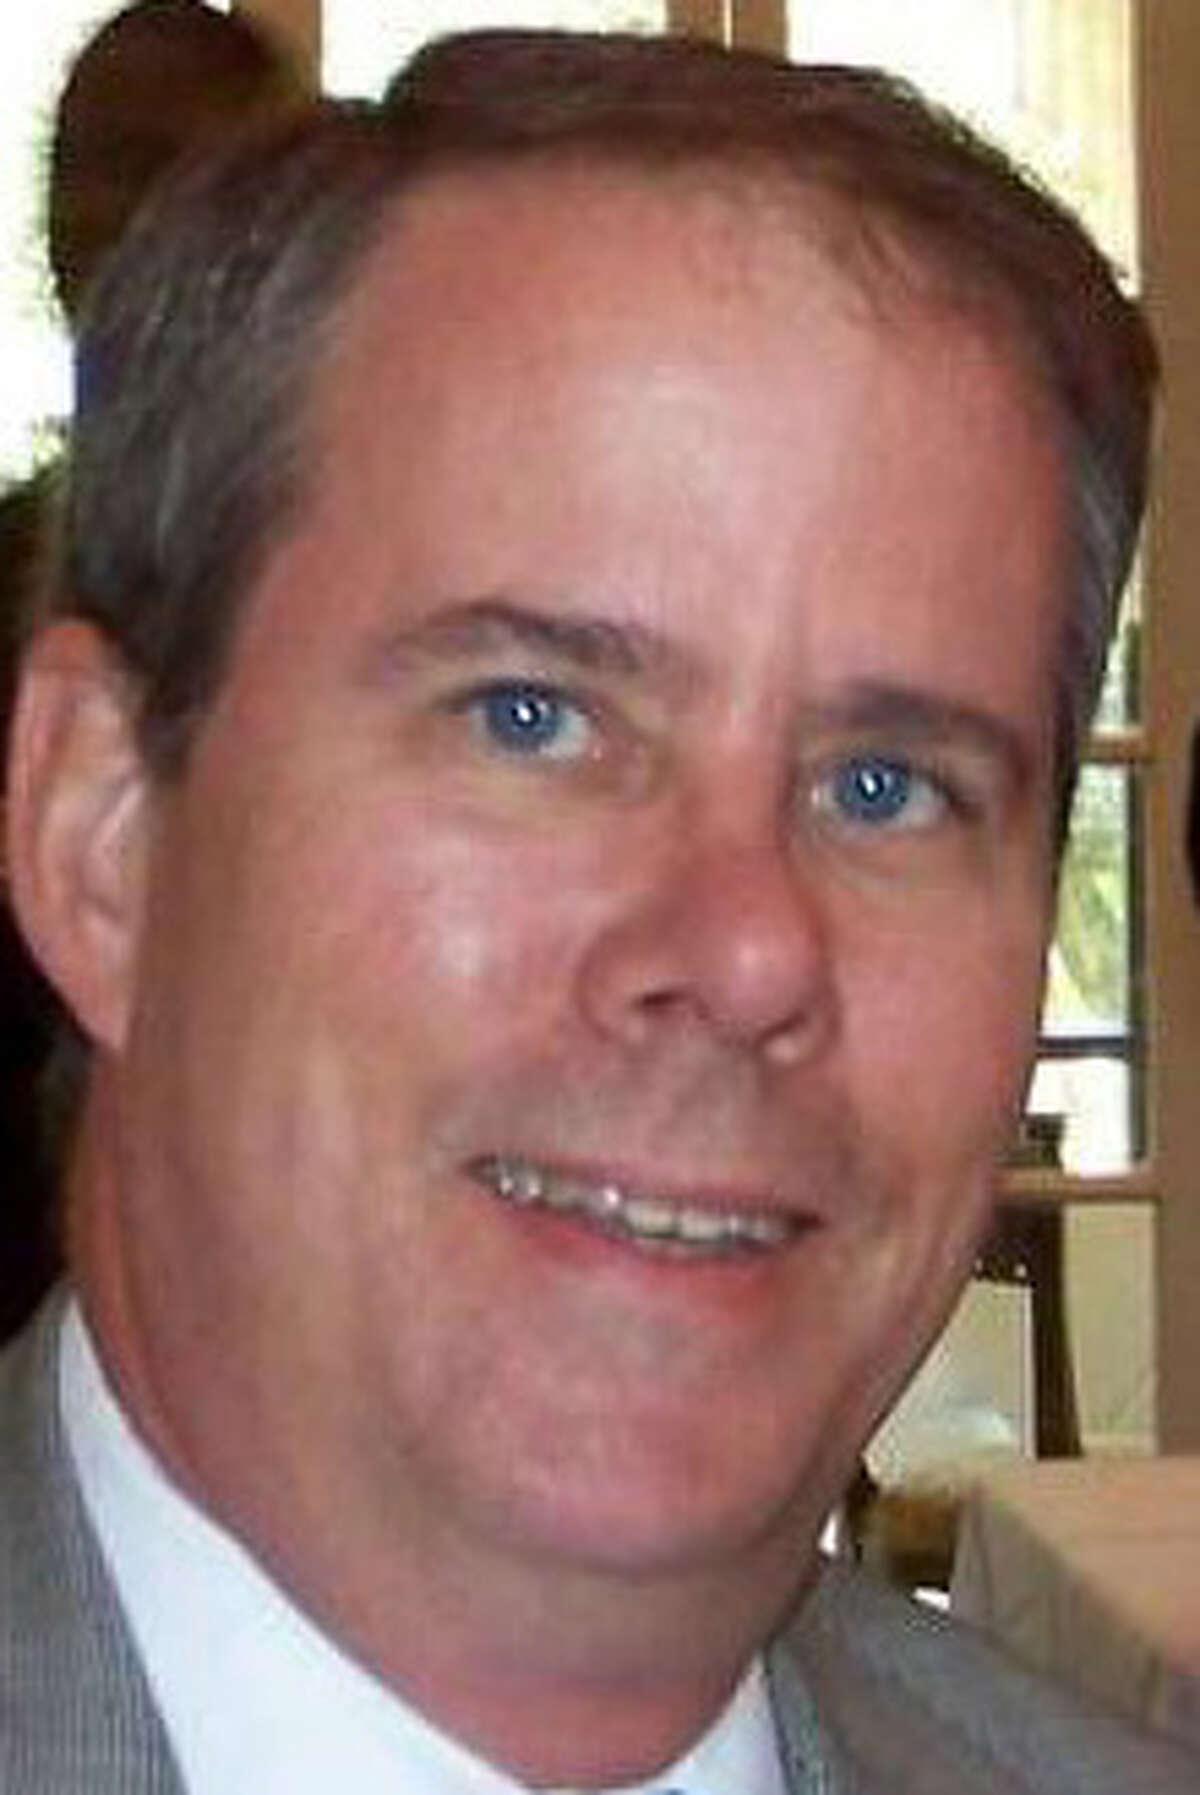 Marty Allday is the executive director of the Consumer Energy Alliance-Texas.